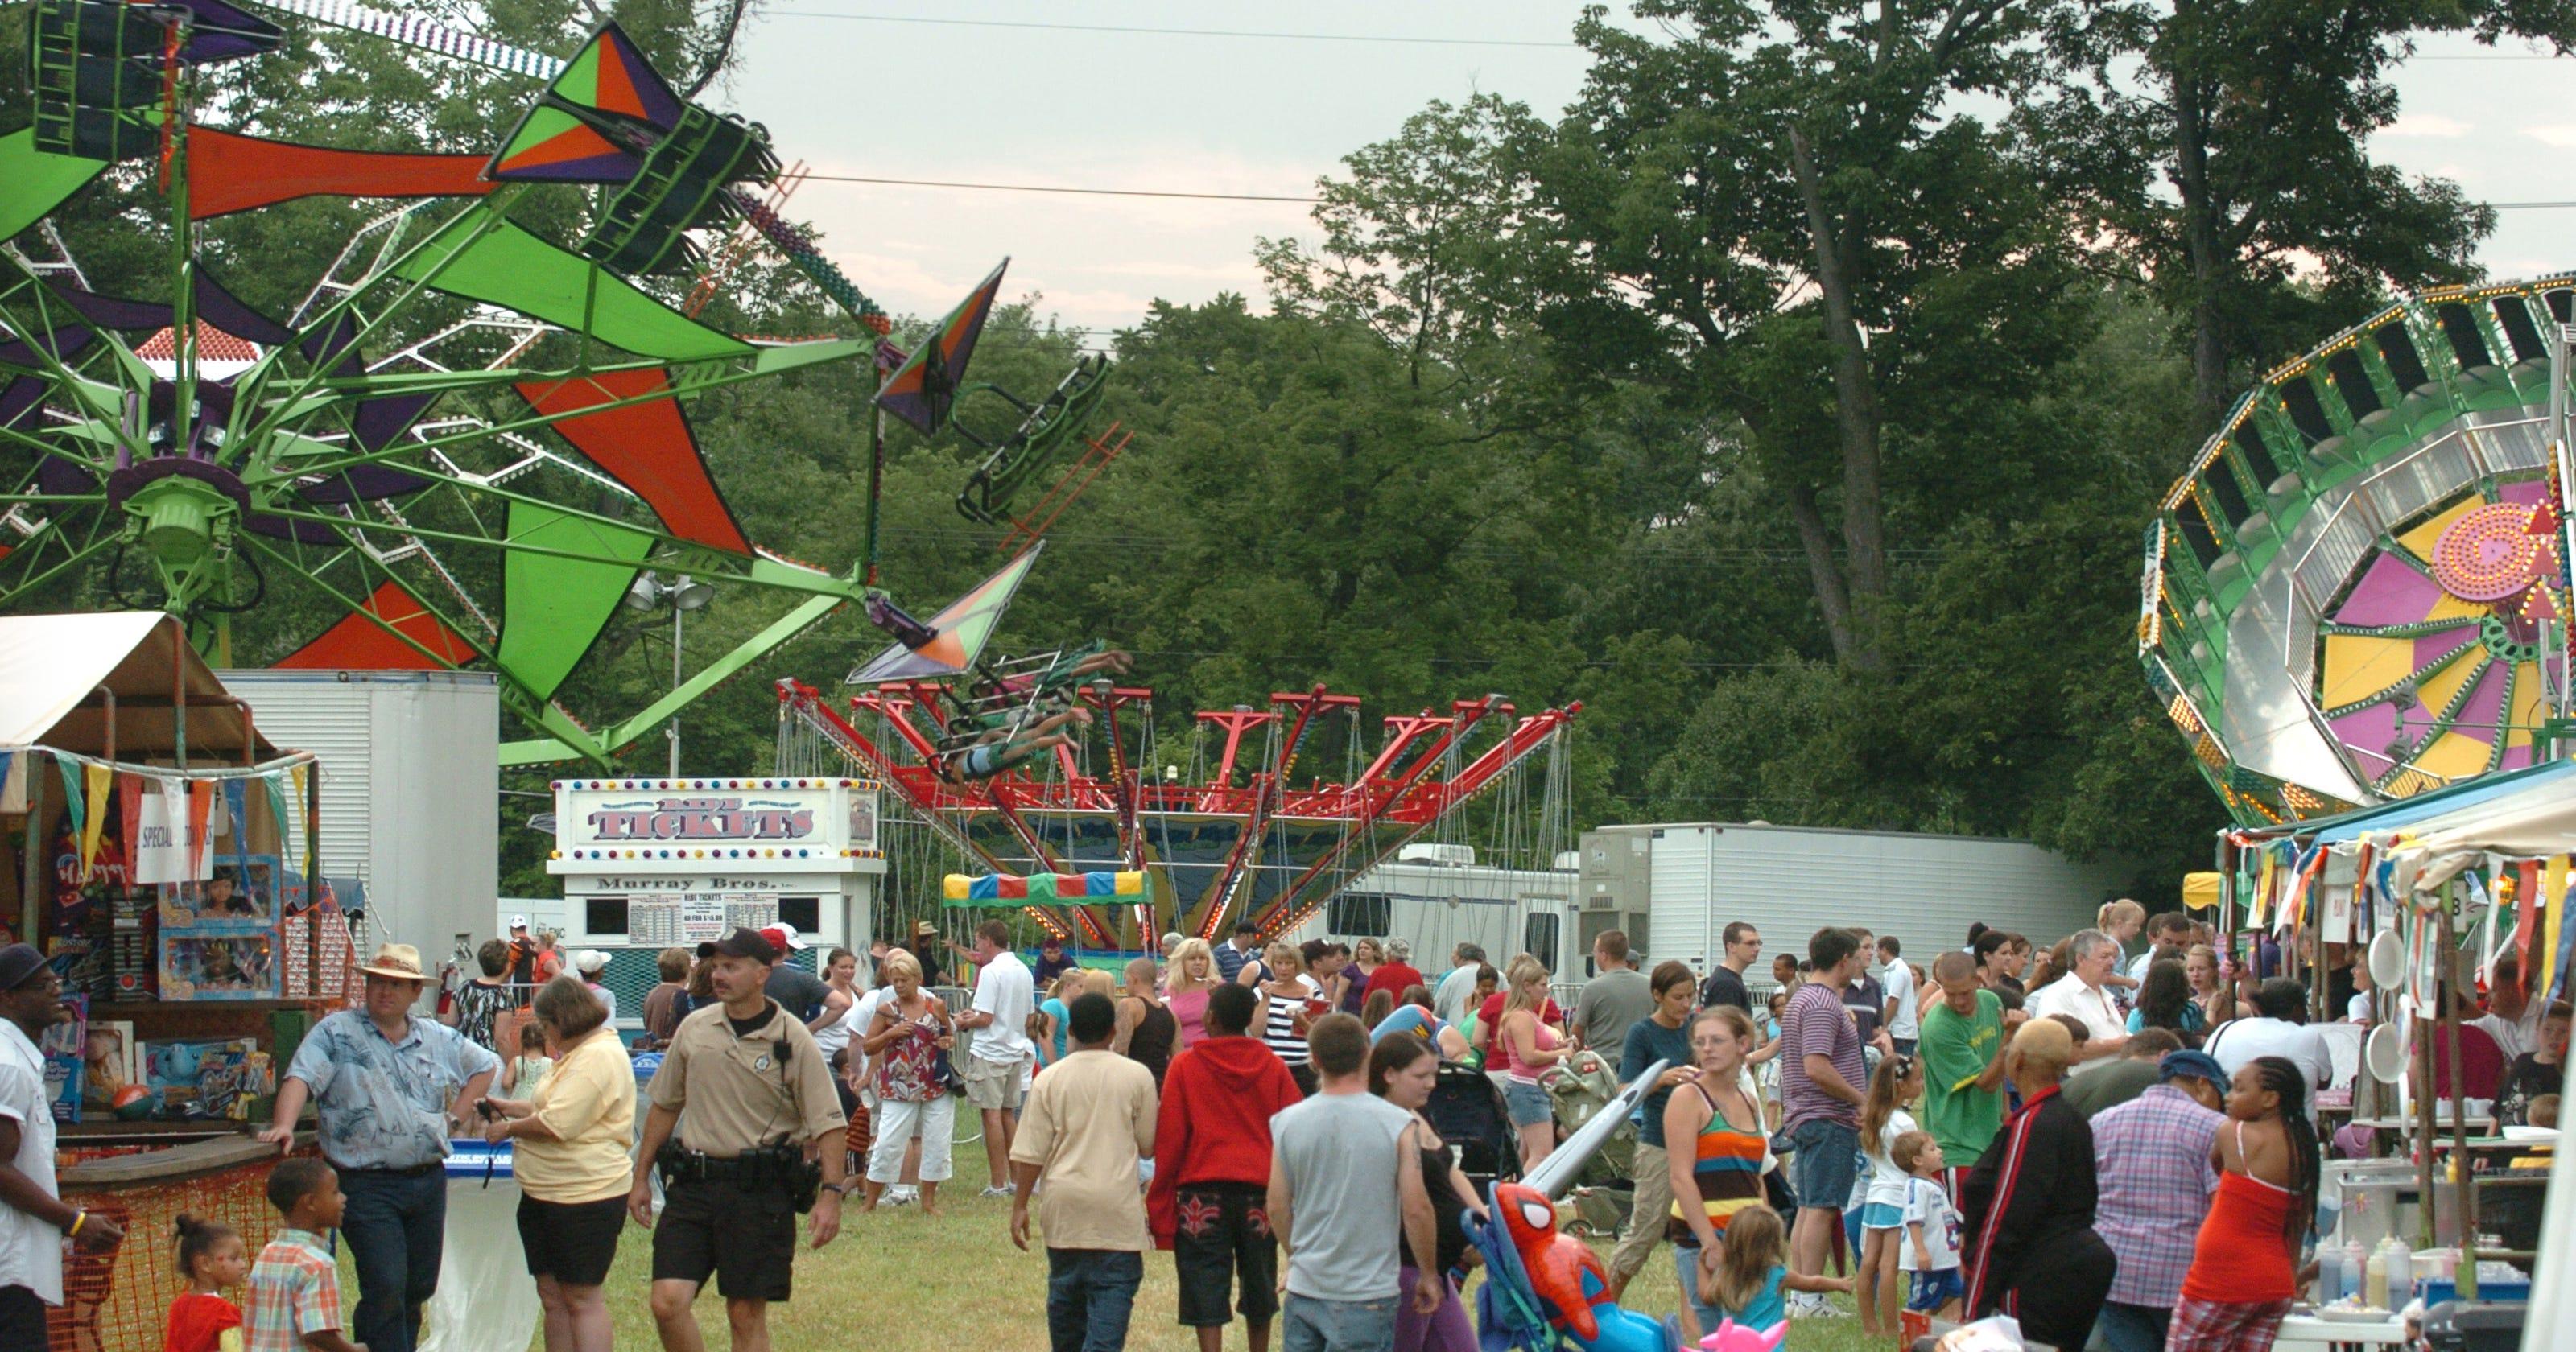 Church festivals in Cincinnati, Northern Kentucky in July